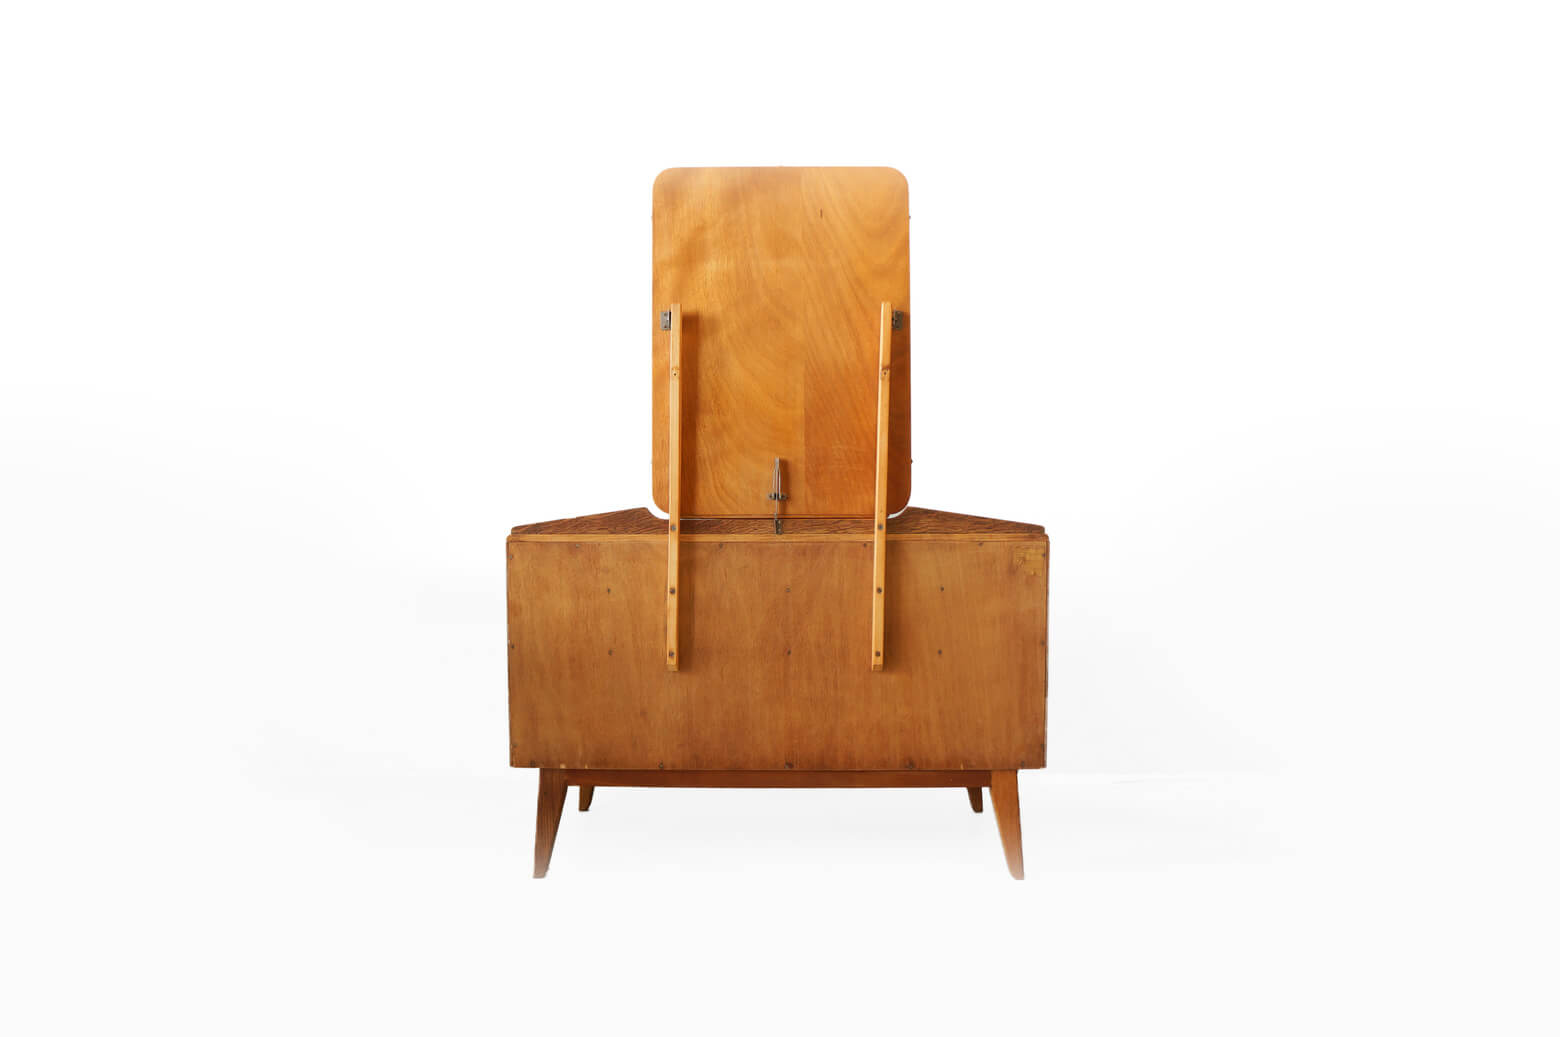 G-PLAN Dresser Table Brandon/ジープラン ドレッサー ブランドン オーク材 イギリス ヴィンテージ